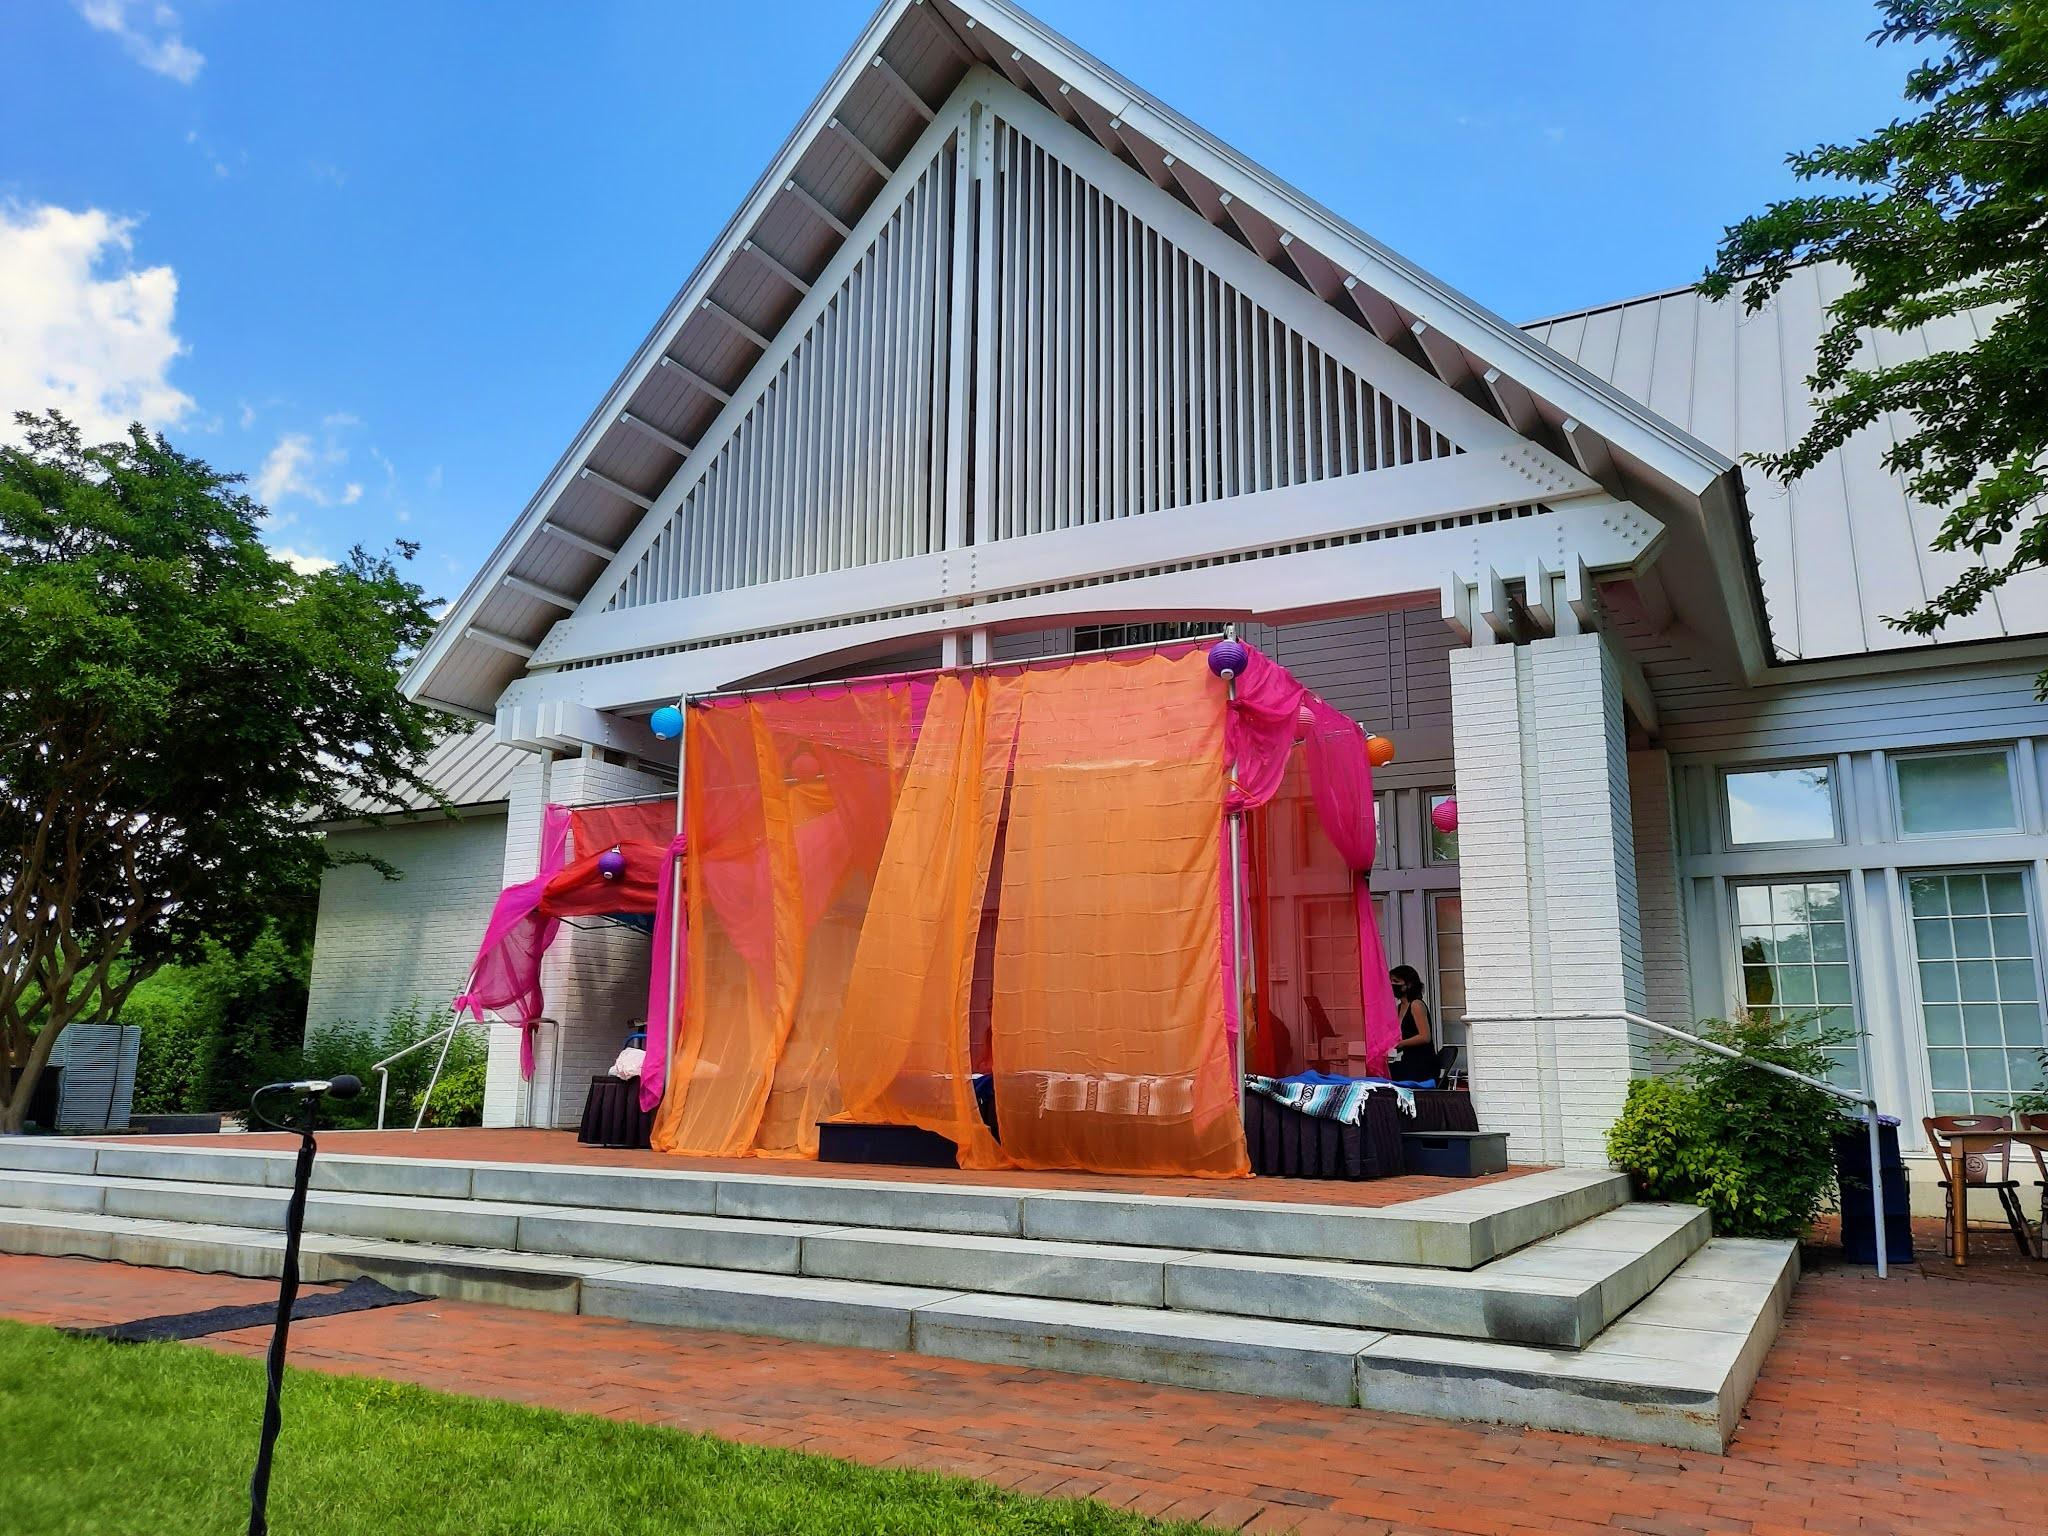 IN REVIEW: the porch of Williamsburg Community Building, setting for Opera in Williamsburg's June 2021 production of Ruggero Leoncavallo's PAGLIACCI [Photograph © by Joseph Newsome]